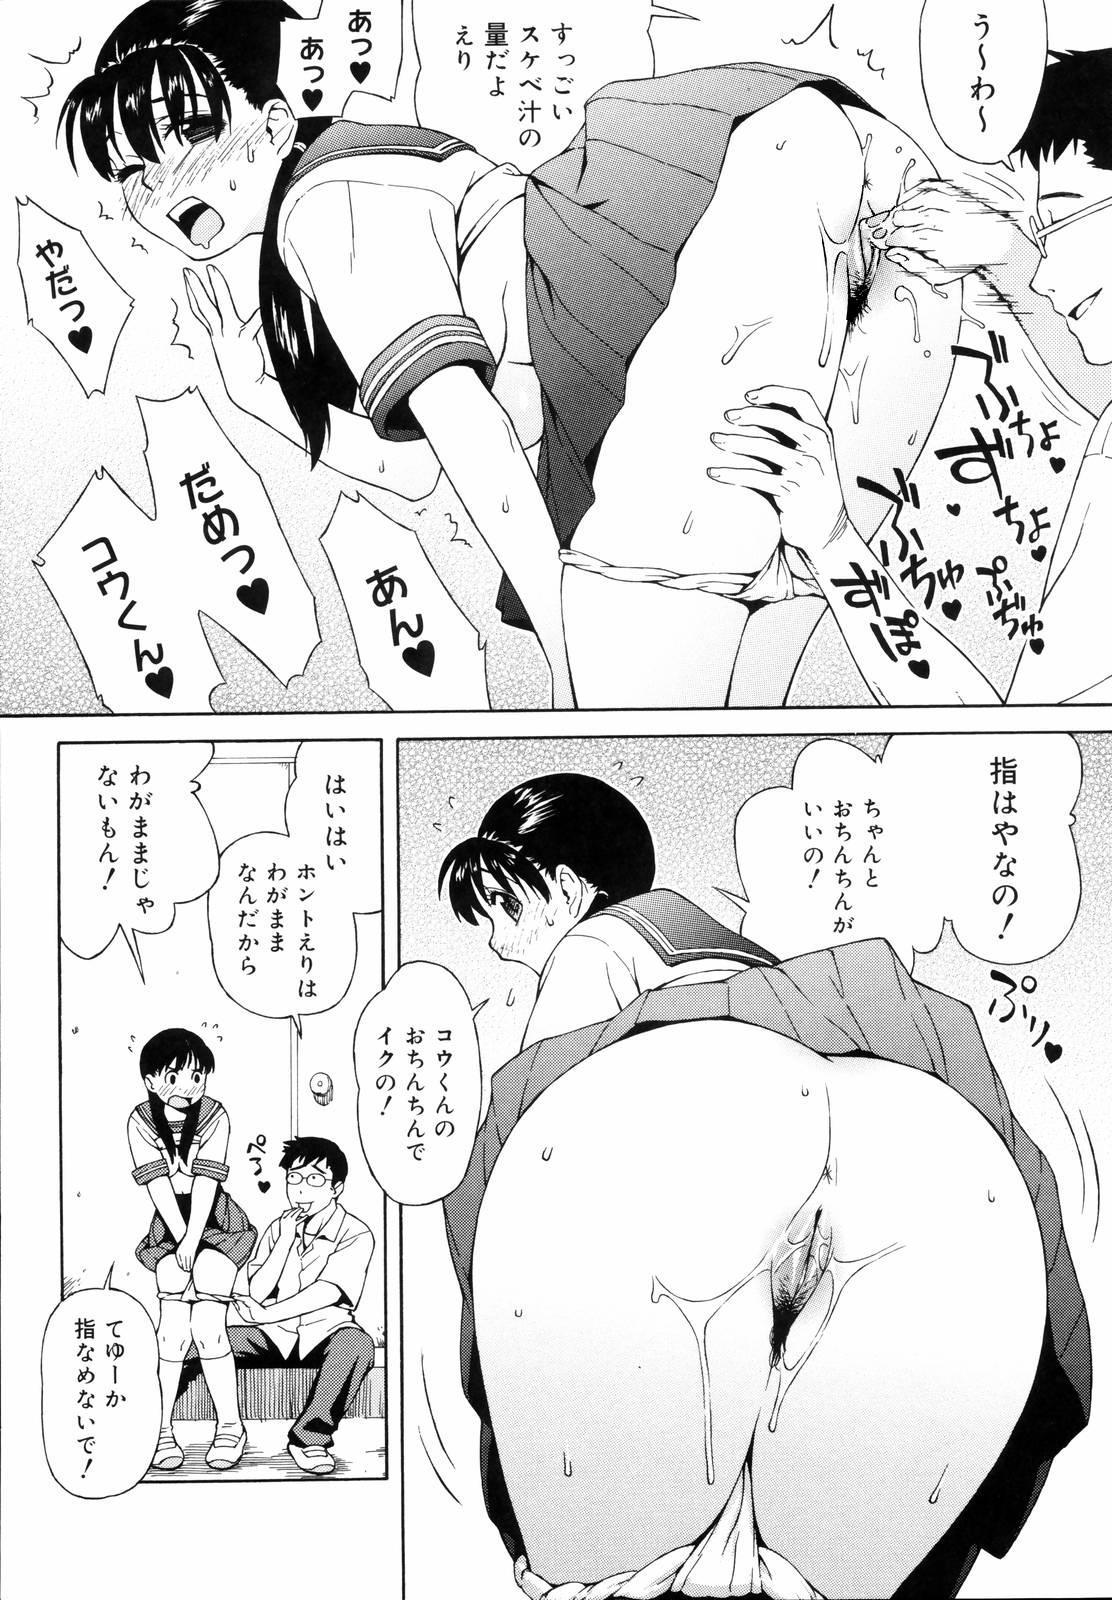 Shishunki wa Hatsujouki - Adolescence is a sexual excitement period. 80